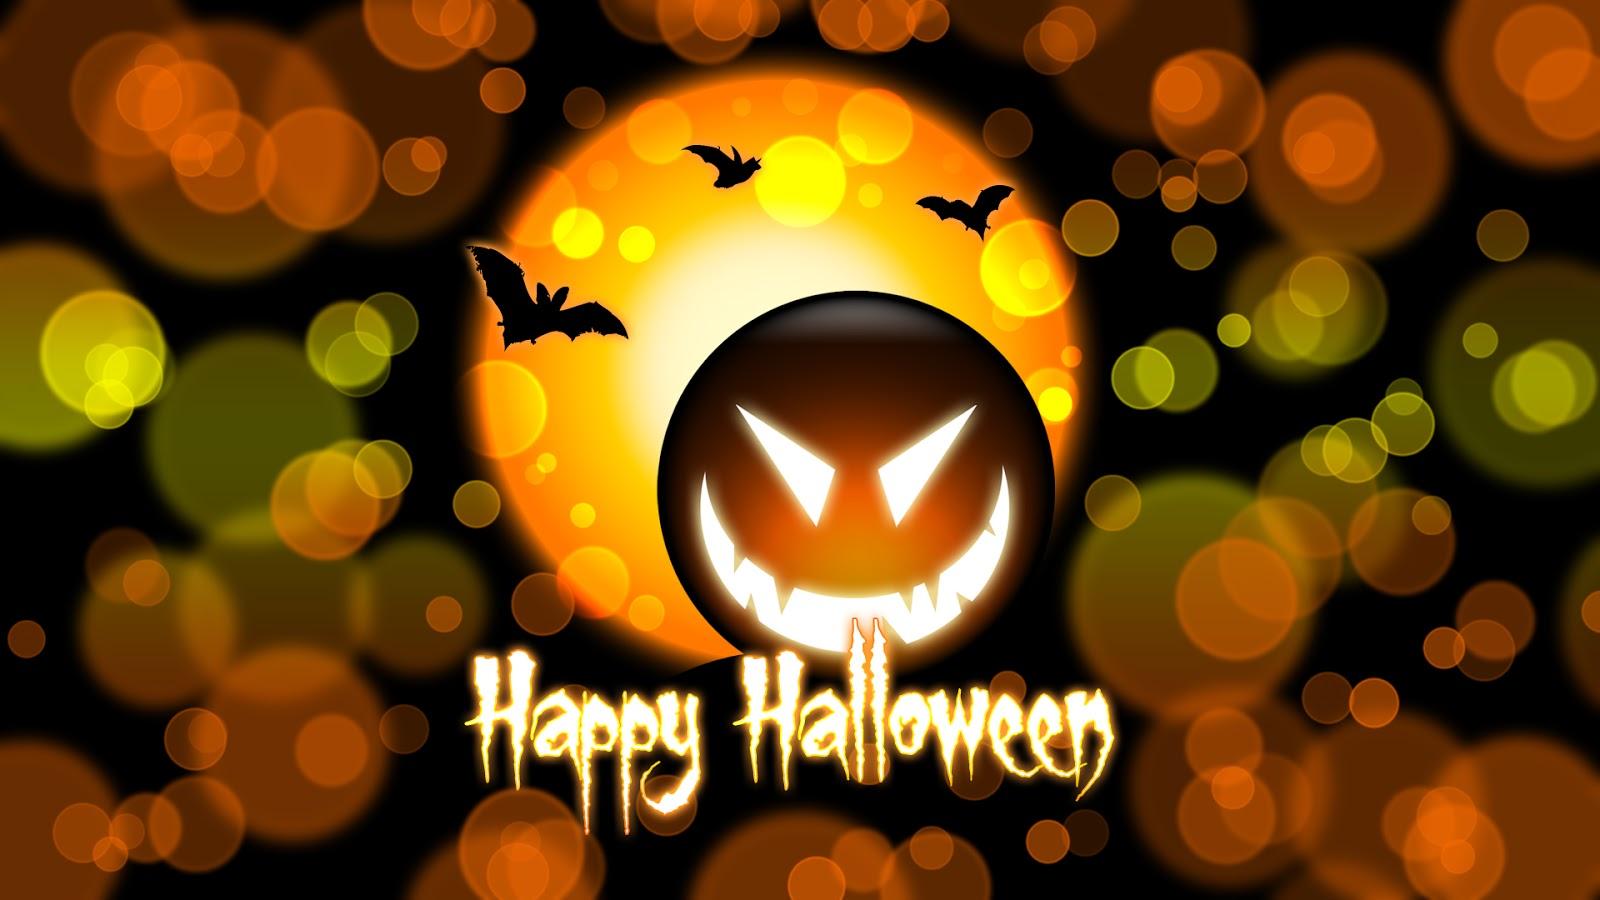 Halloween Wallpaper Tumblr